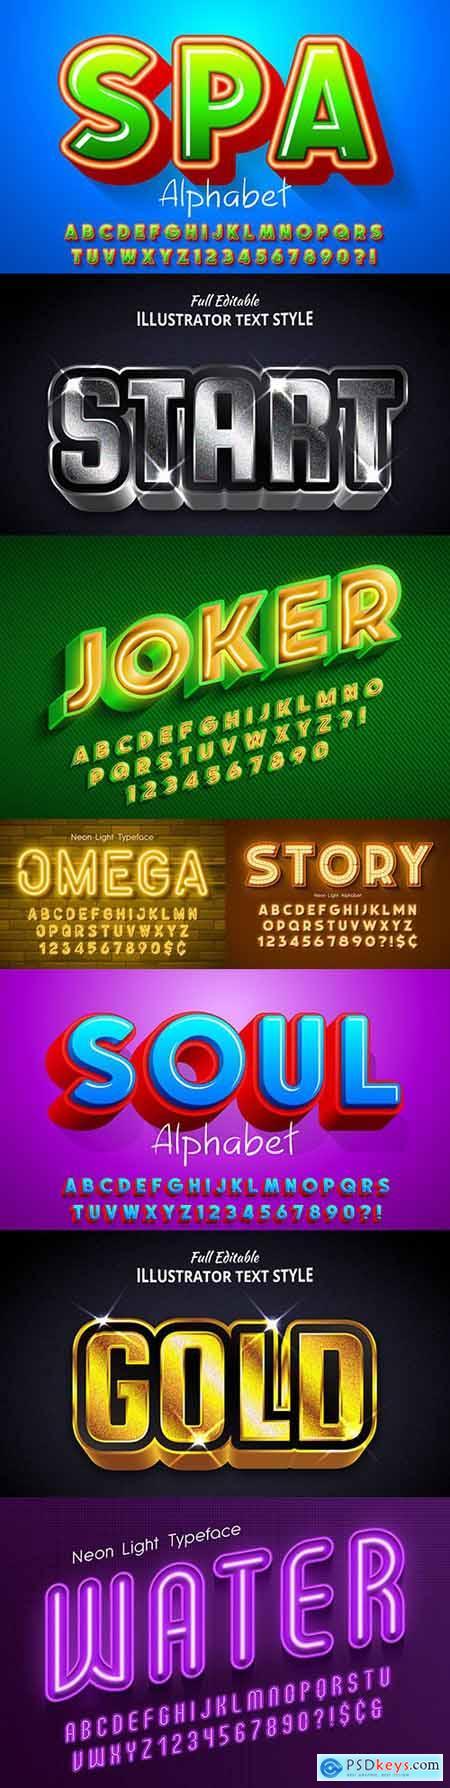 Editable font effect text collection illustration design 50